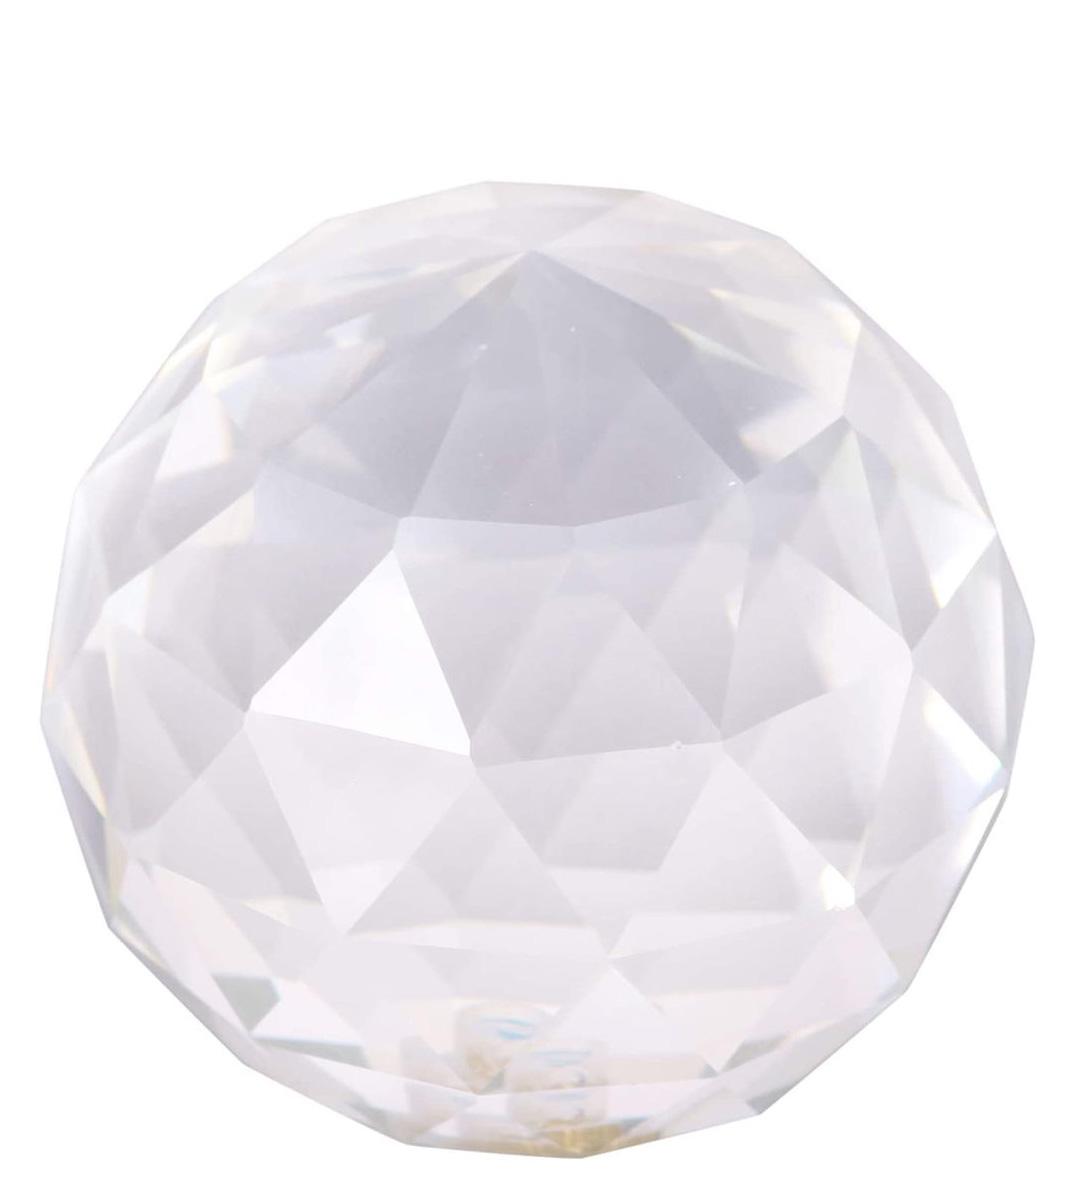 Bola de cristal fotográfica